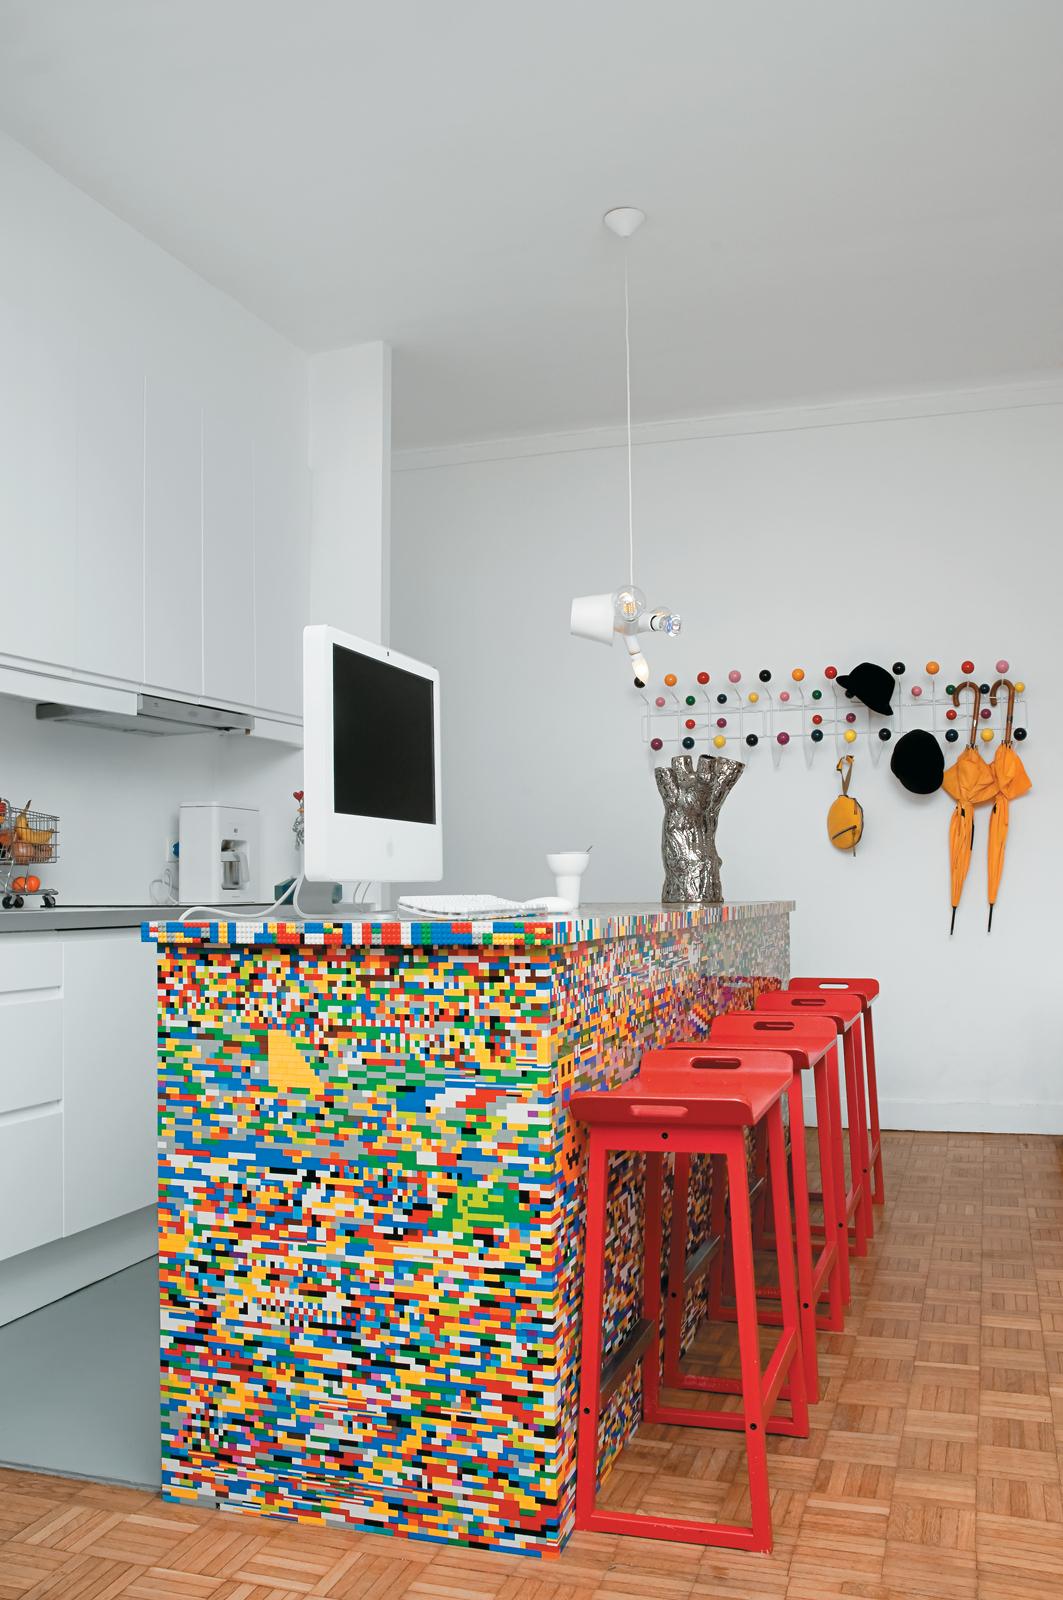 lego island interior kitchen island